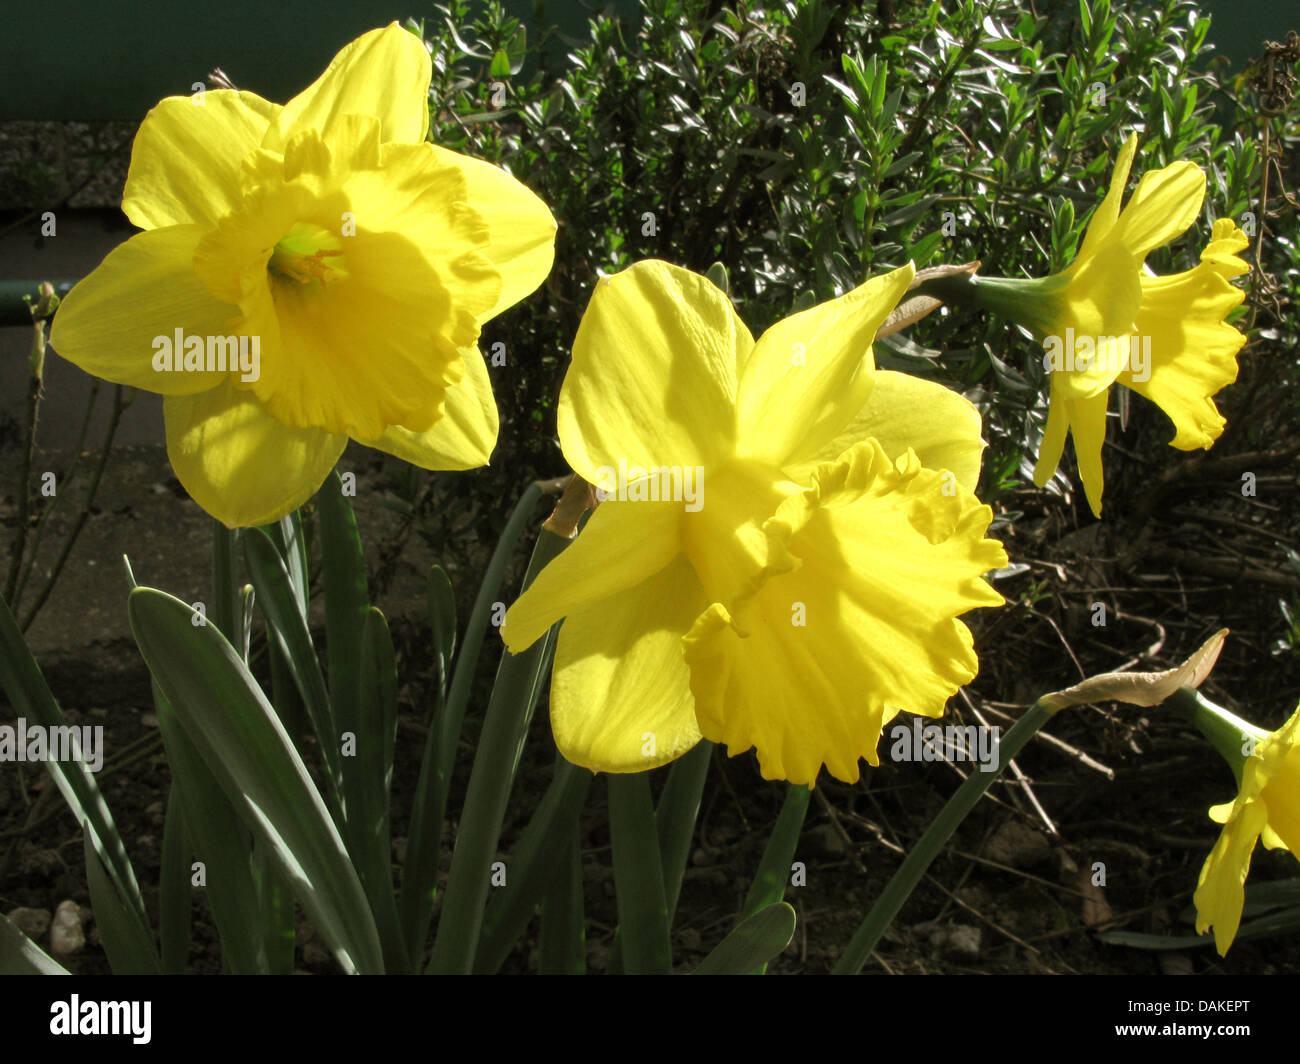 daffodil (Narcissus 'Gigantic Star', Narcissus Gigantic Star), cultivar Gigantic star, flowers in backlight - Stock Image